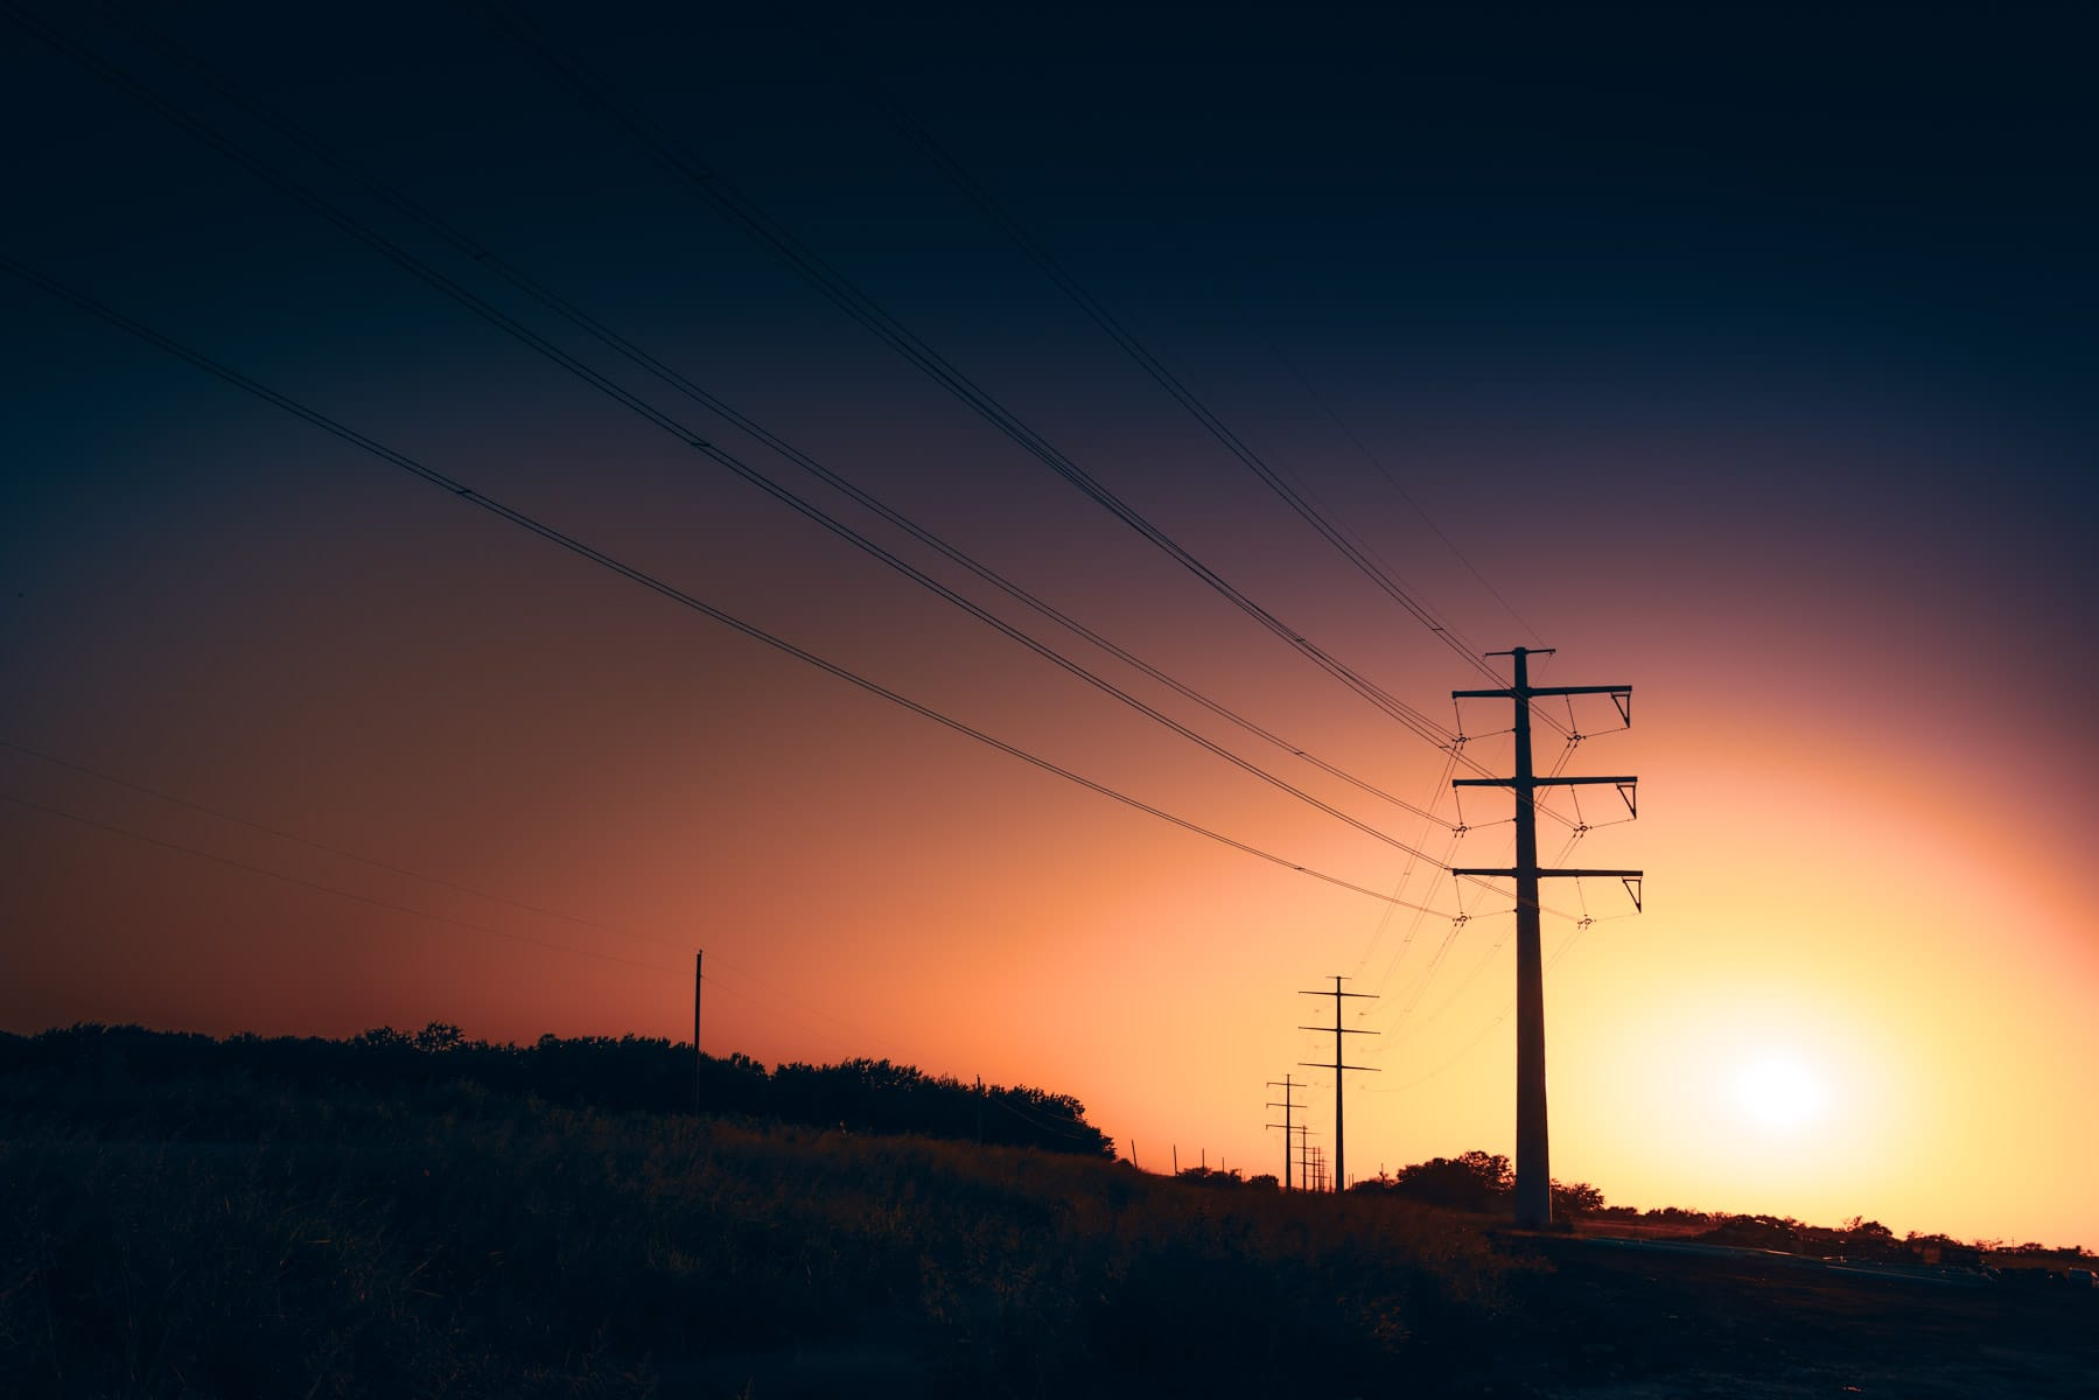 Sunset on power lines near Celina, Texas.